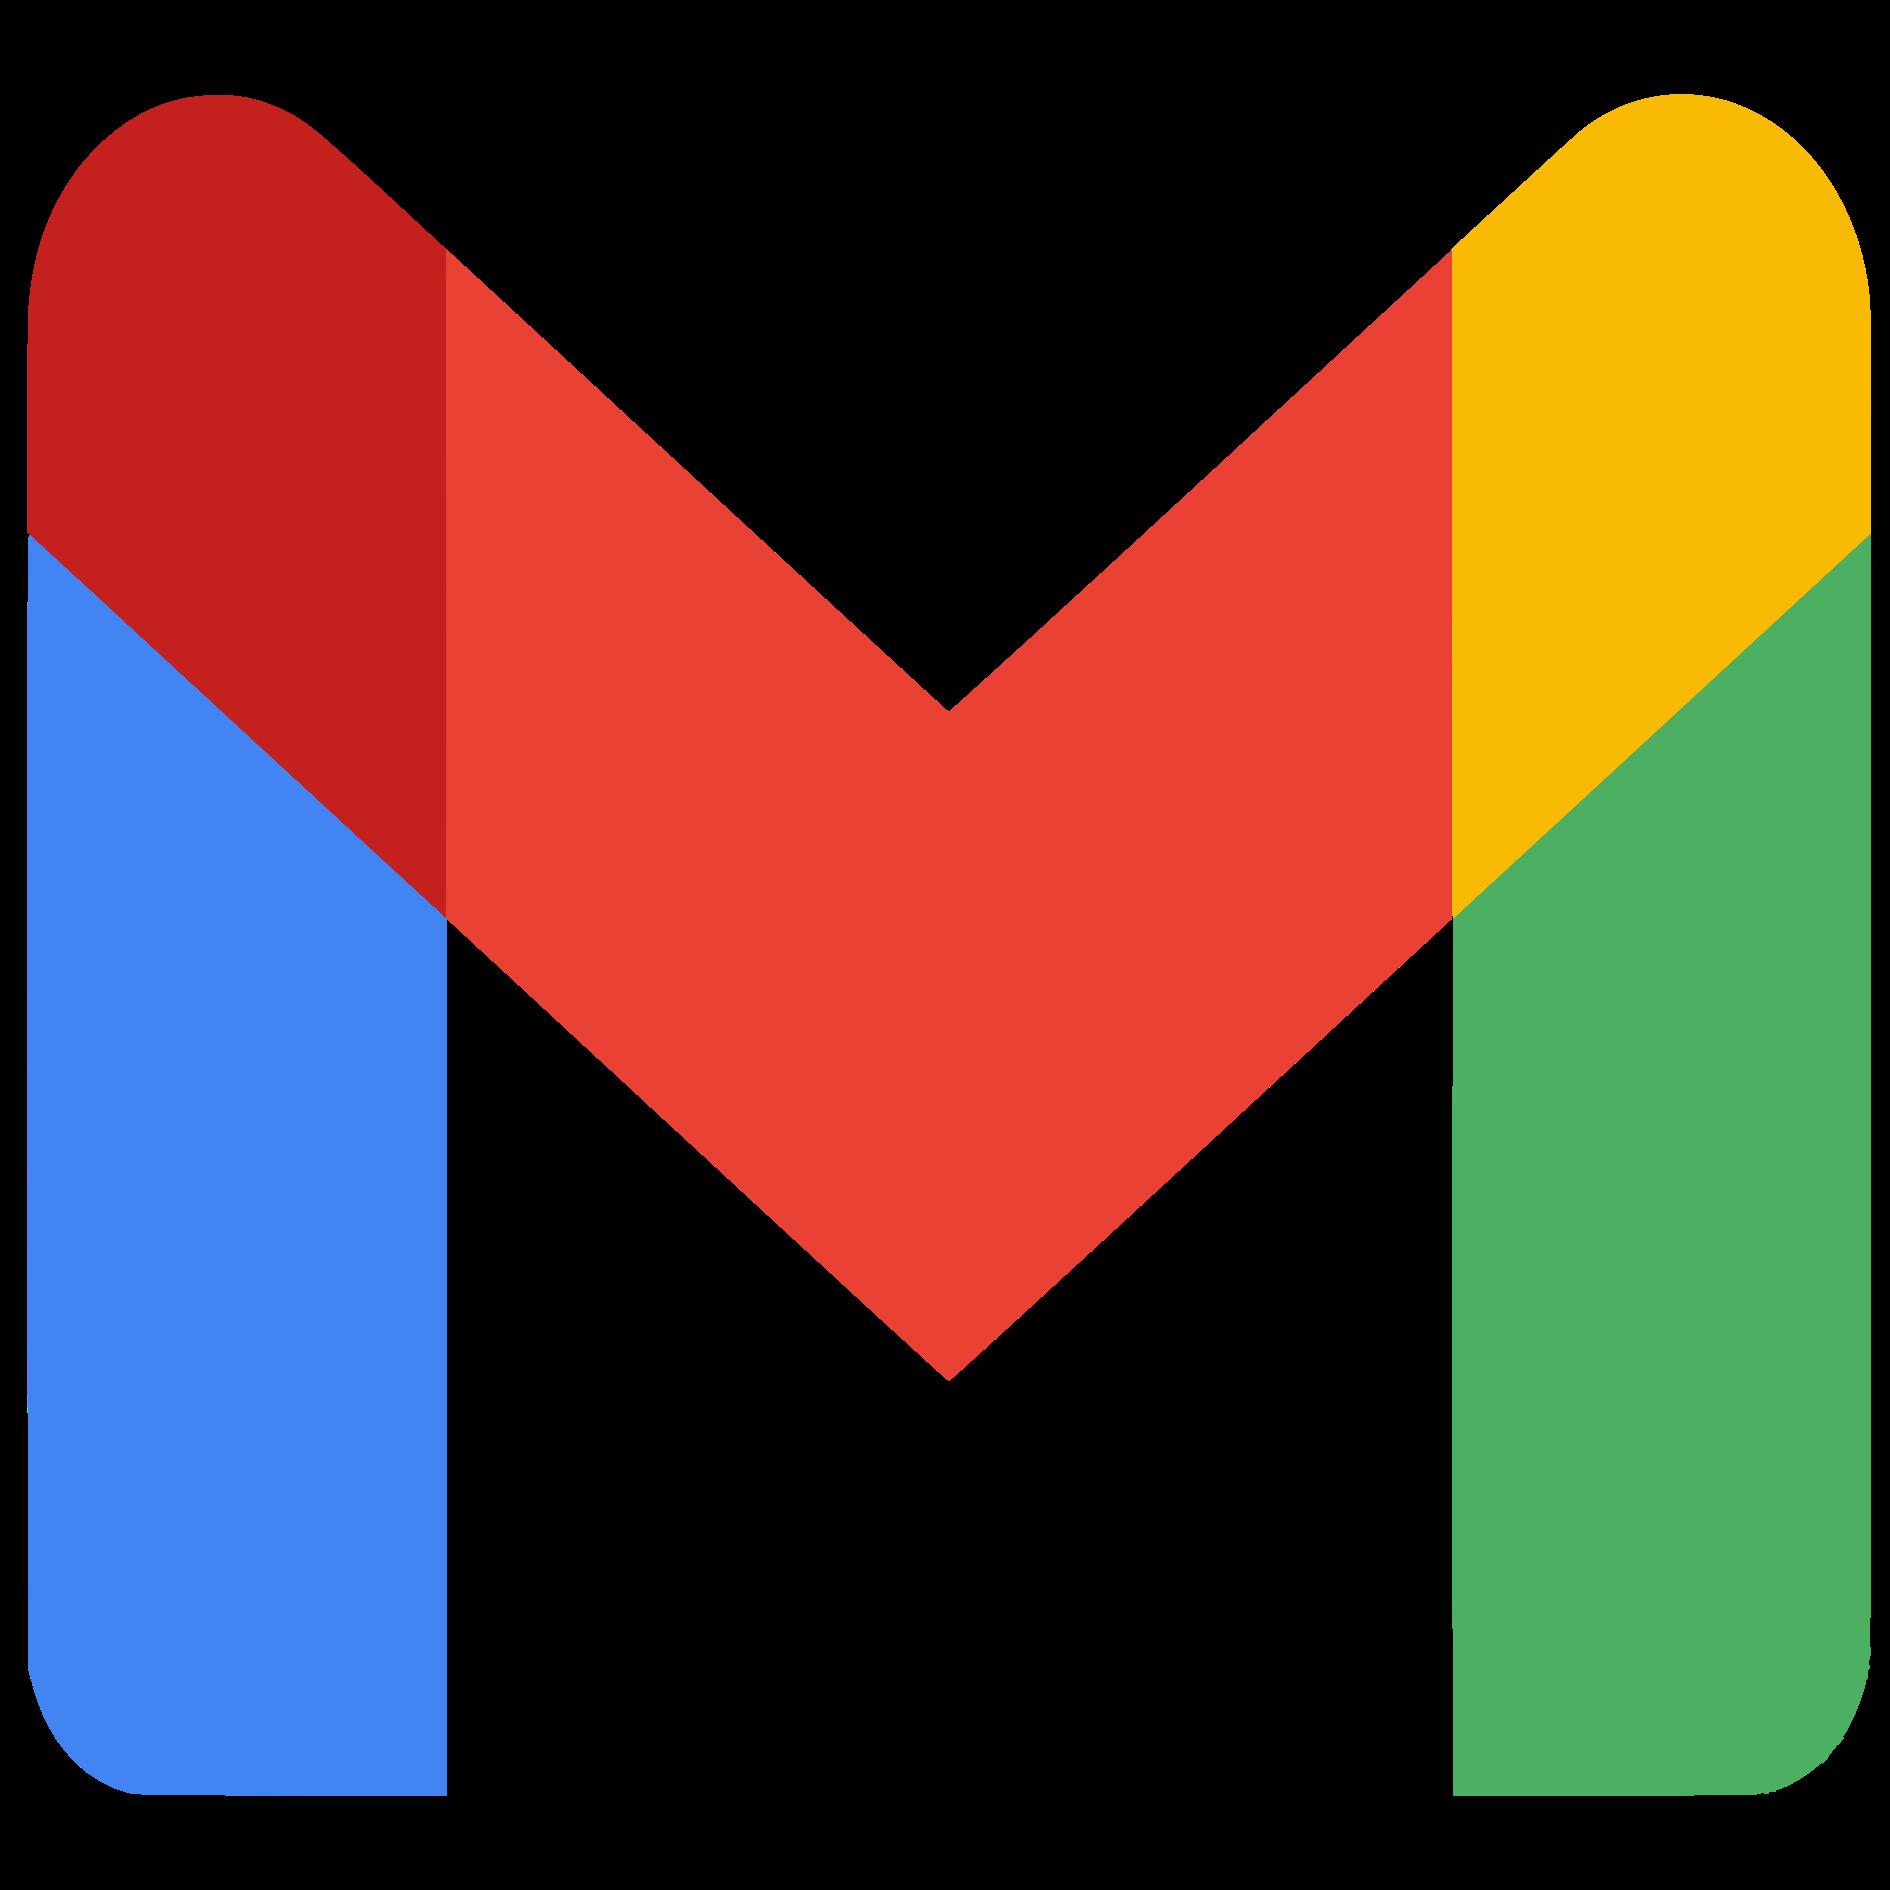 Google Gmail Logo In 2021 Internet Logo Anime Scenery Wallpaper Color Free